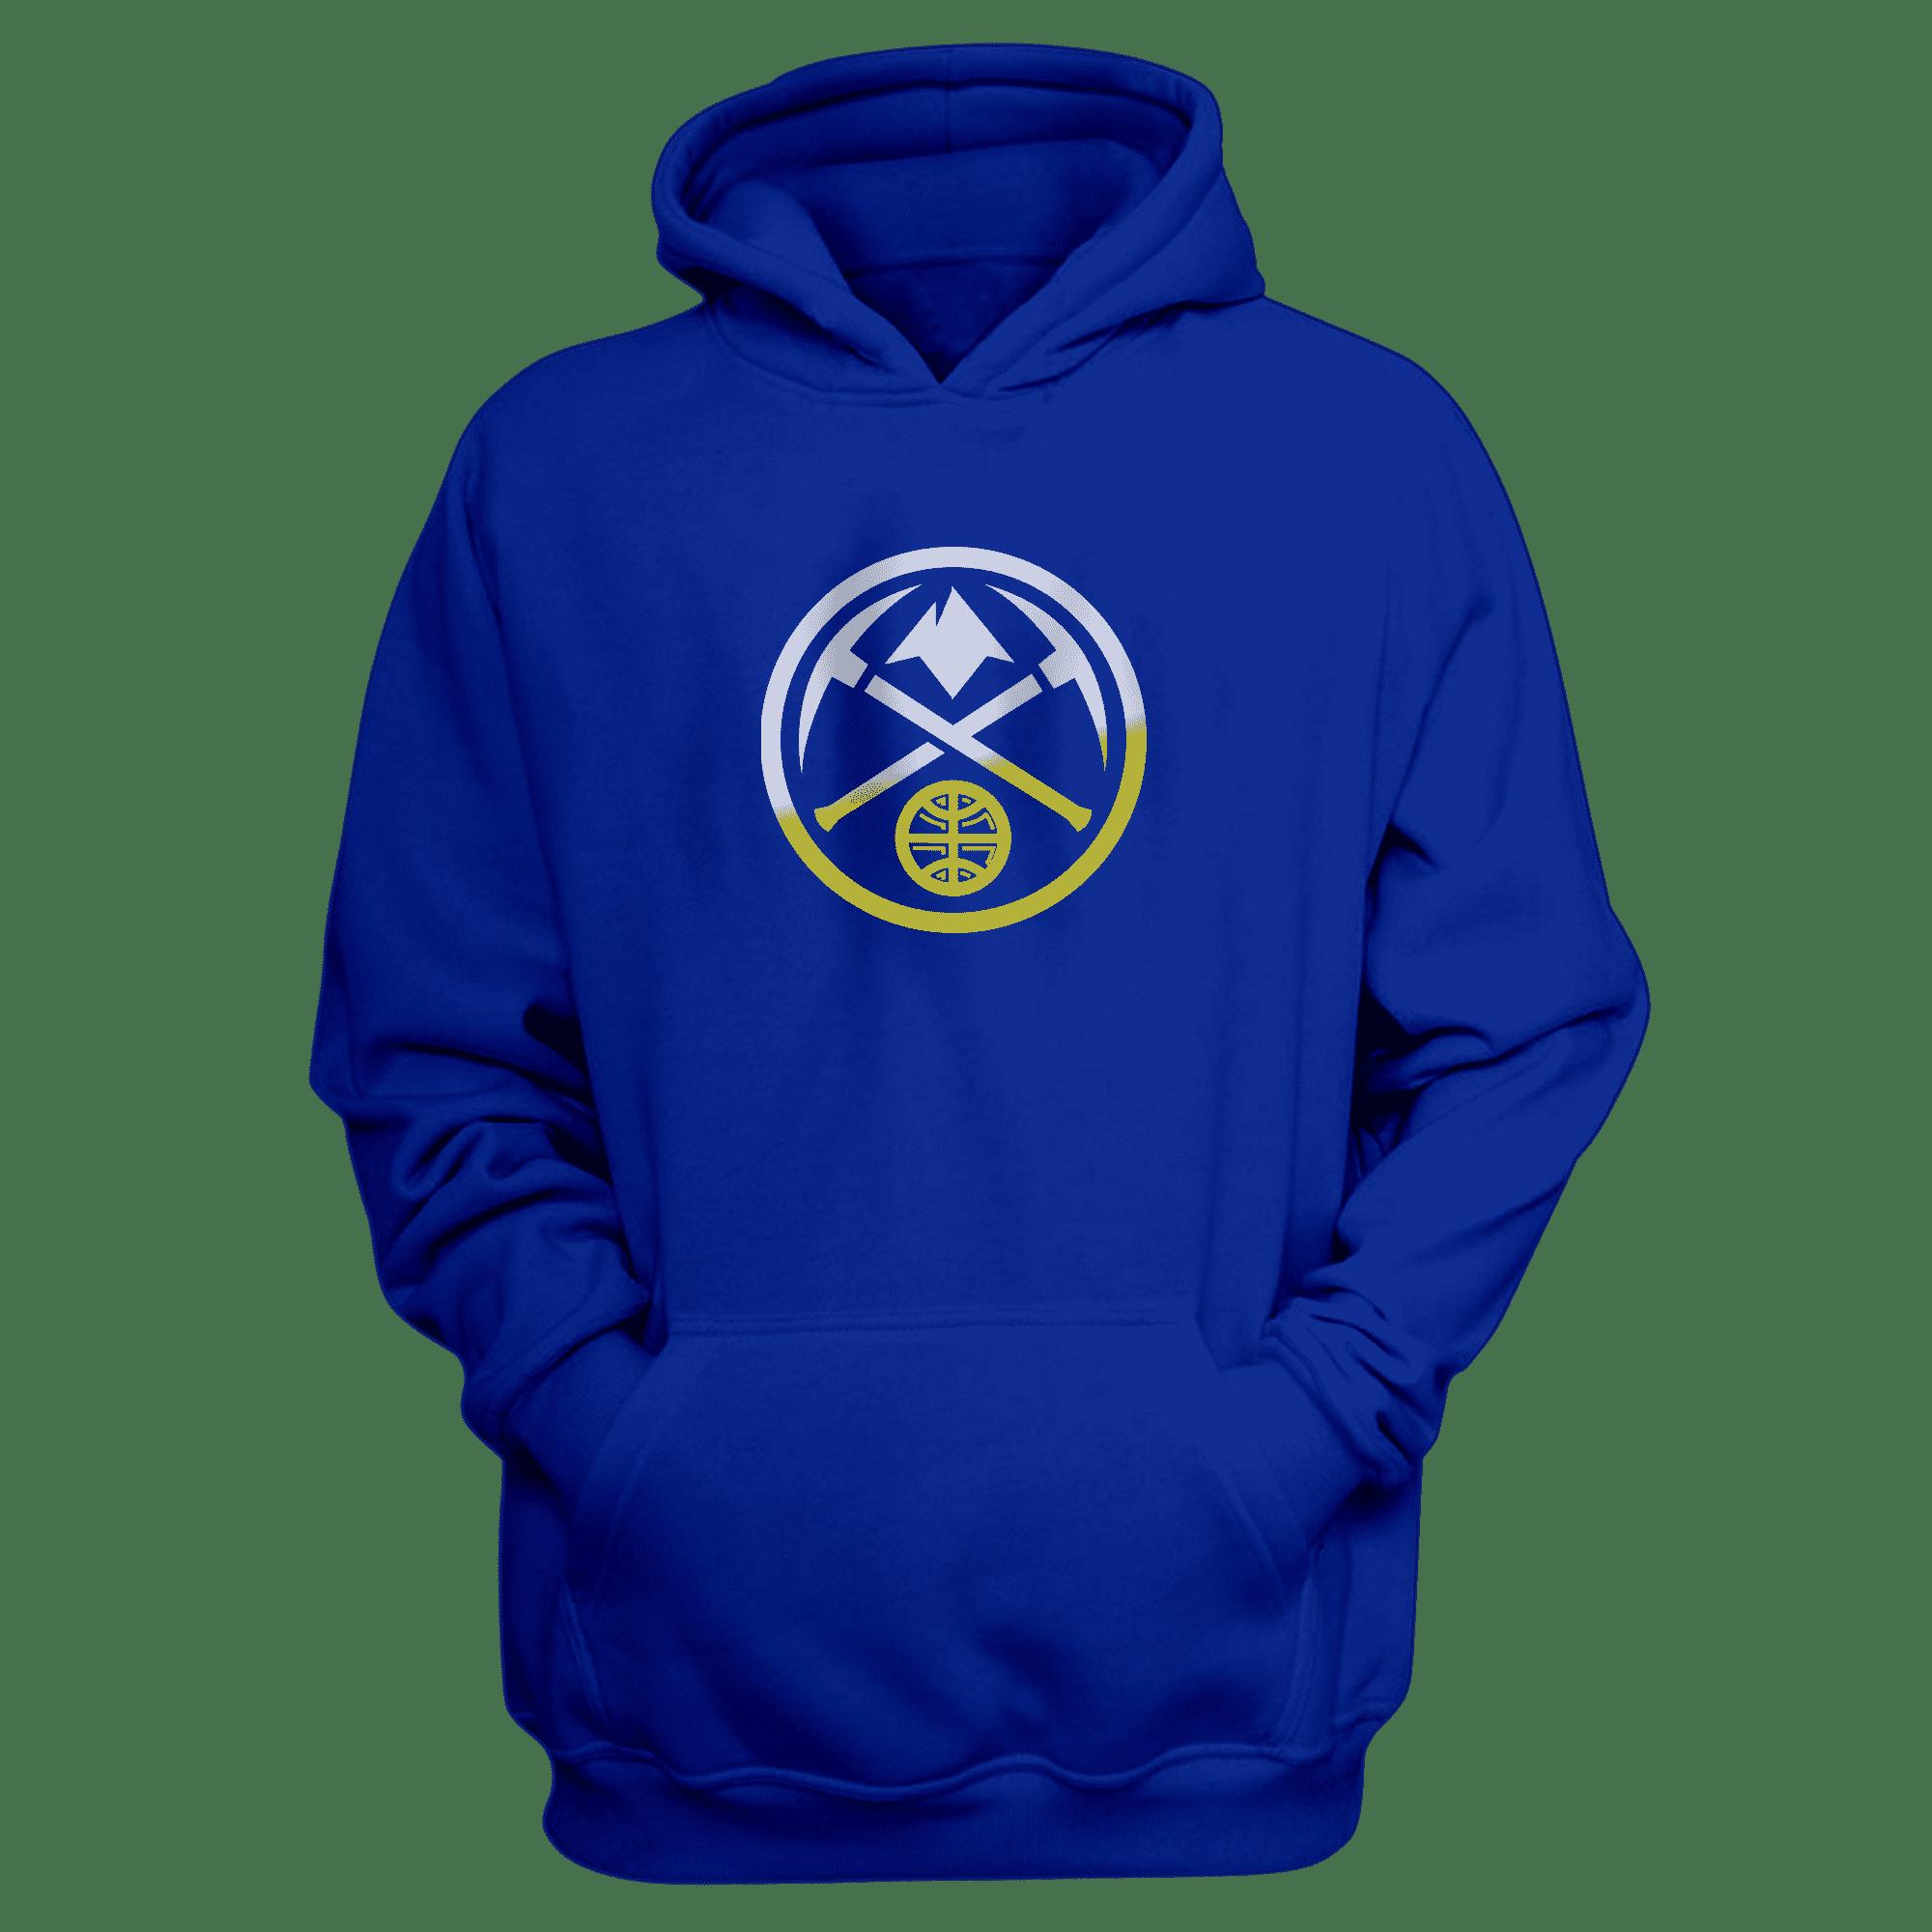 Denver Nuggets Logo Hoodie (HD-BLU-NP-305-NBA-denver-nuggets-logo)